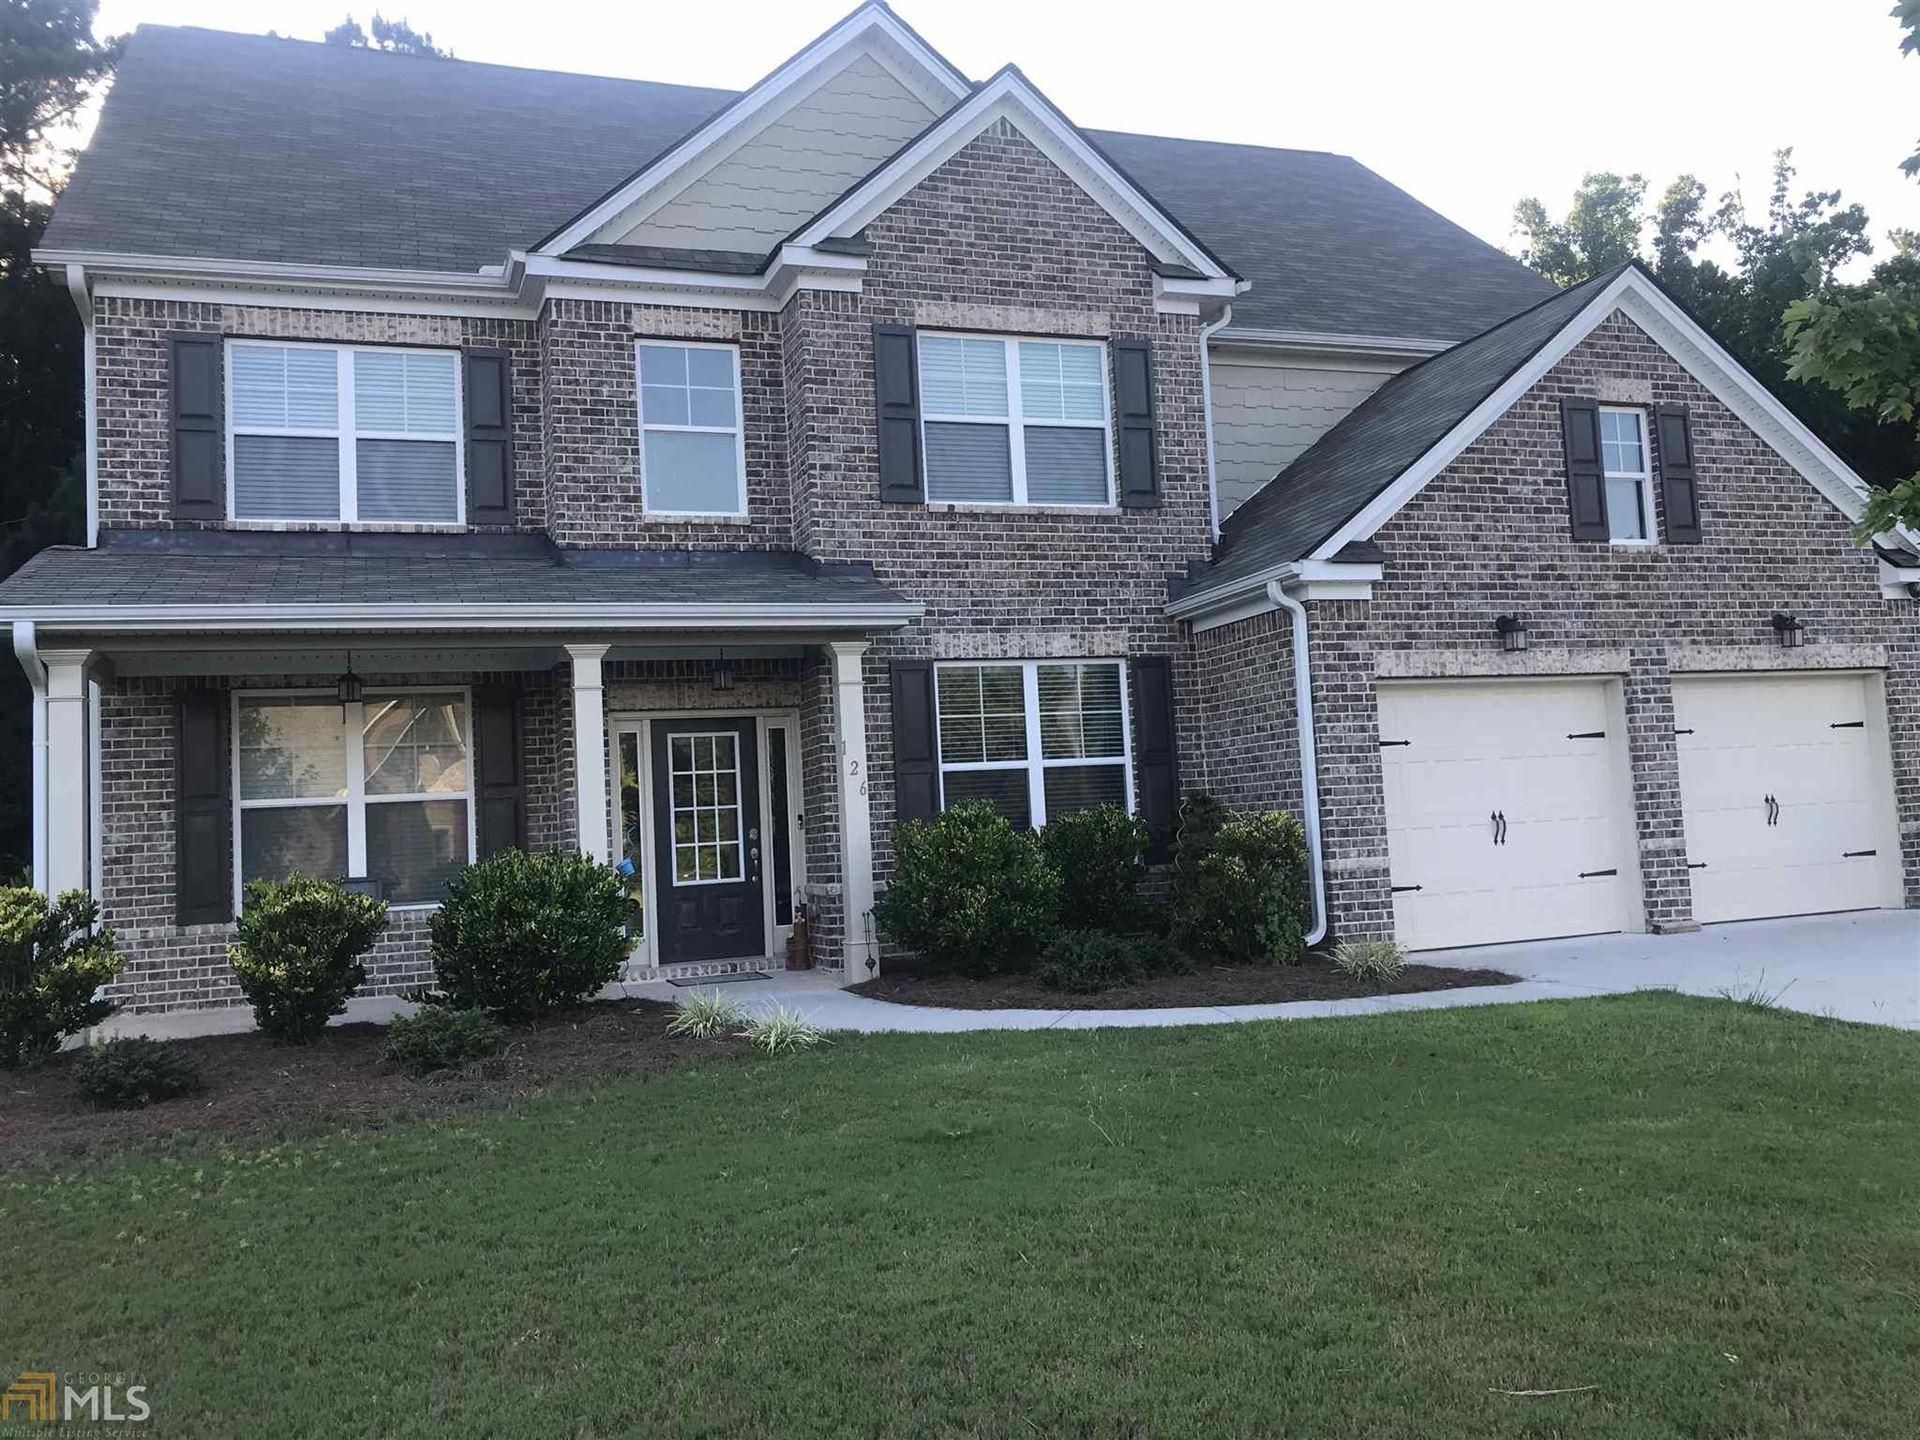 126 Oakleigh Pointe Dr, Dallas, GA 30157 - MLS#: 8841264